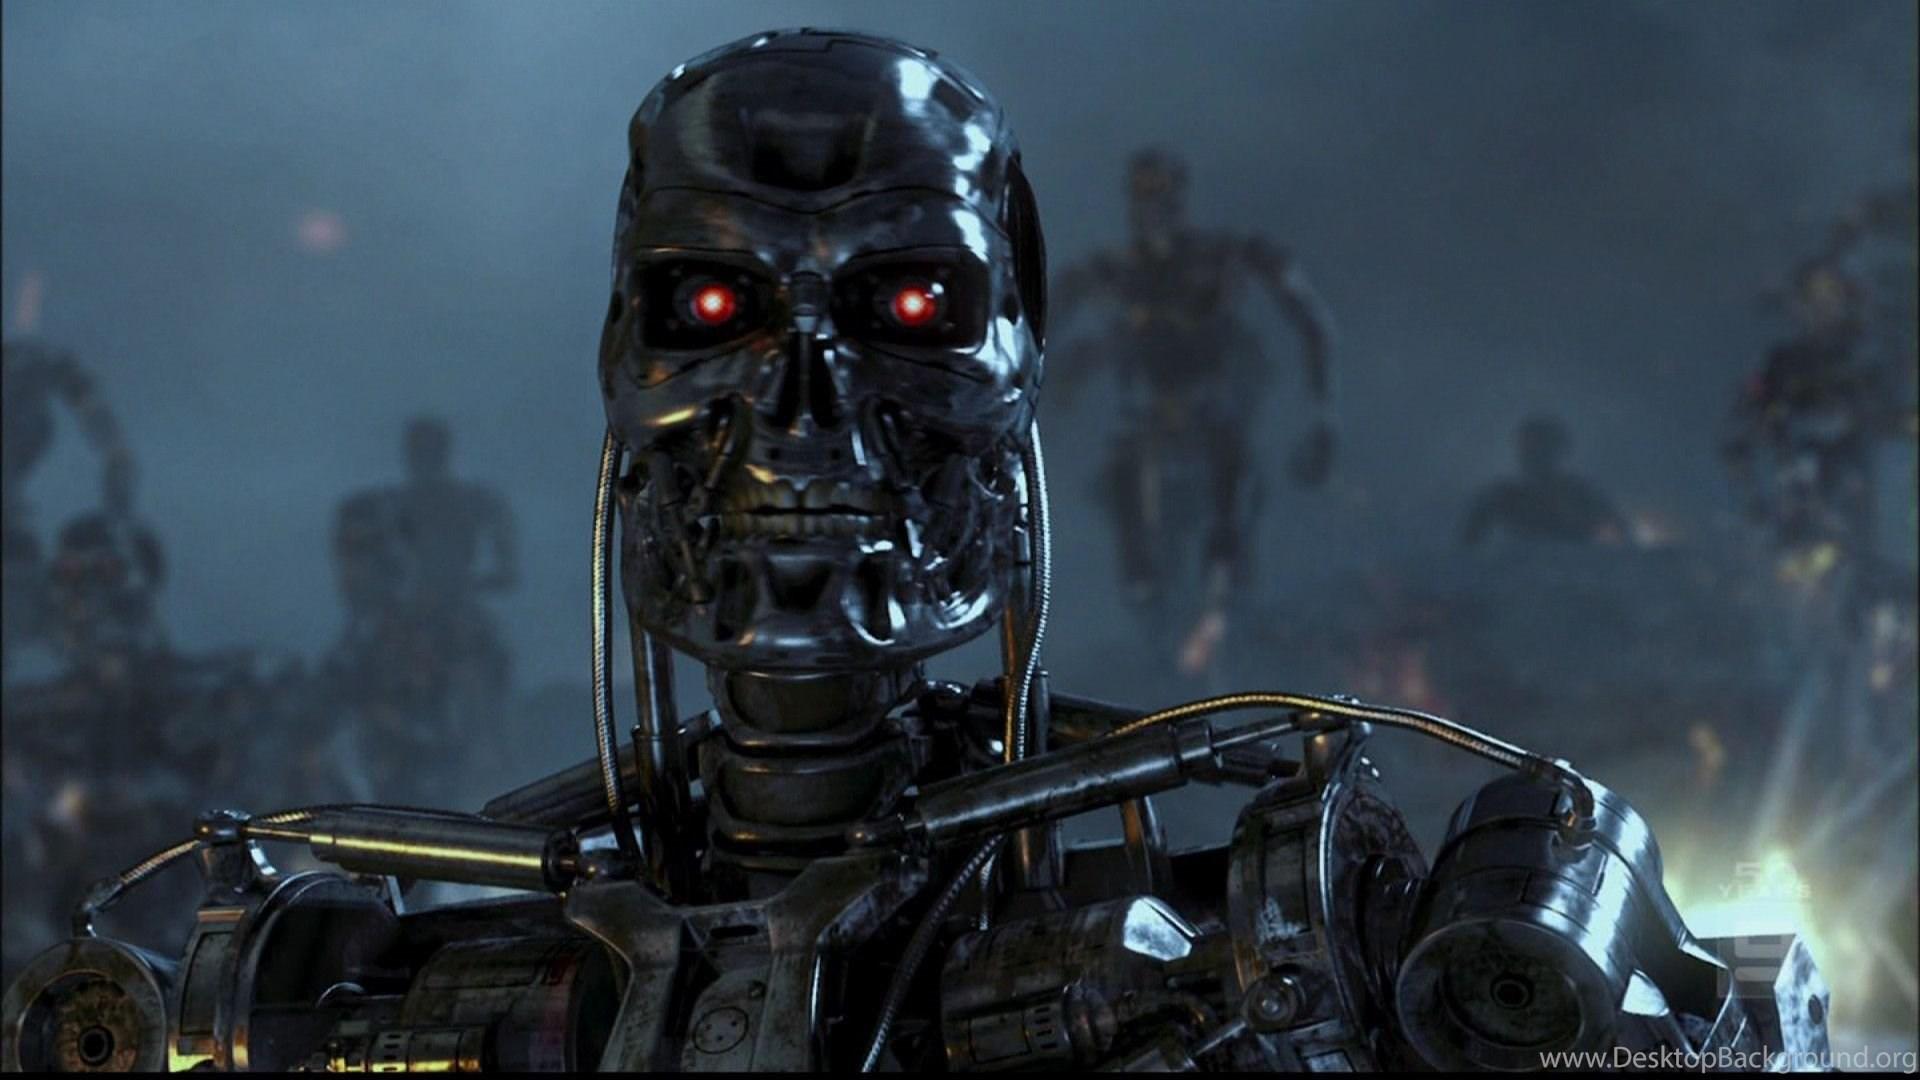 Terminator hd wallpaper terminator images free new wallpapers desktop background - Terminator 2 wallpaper hd ...